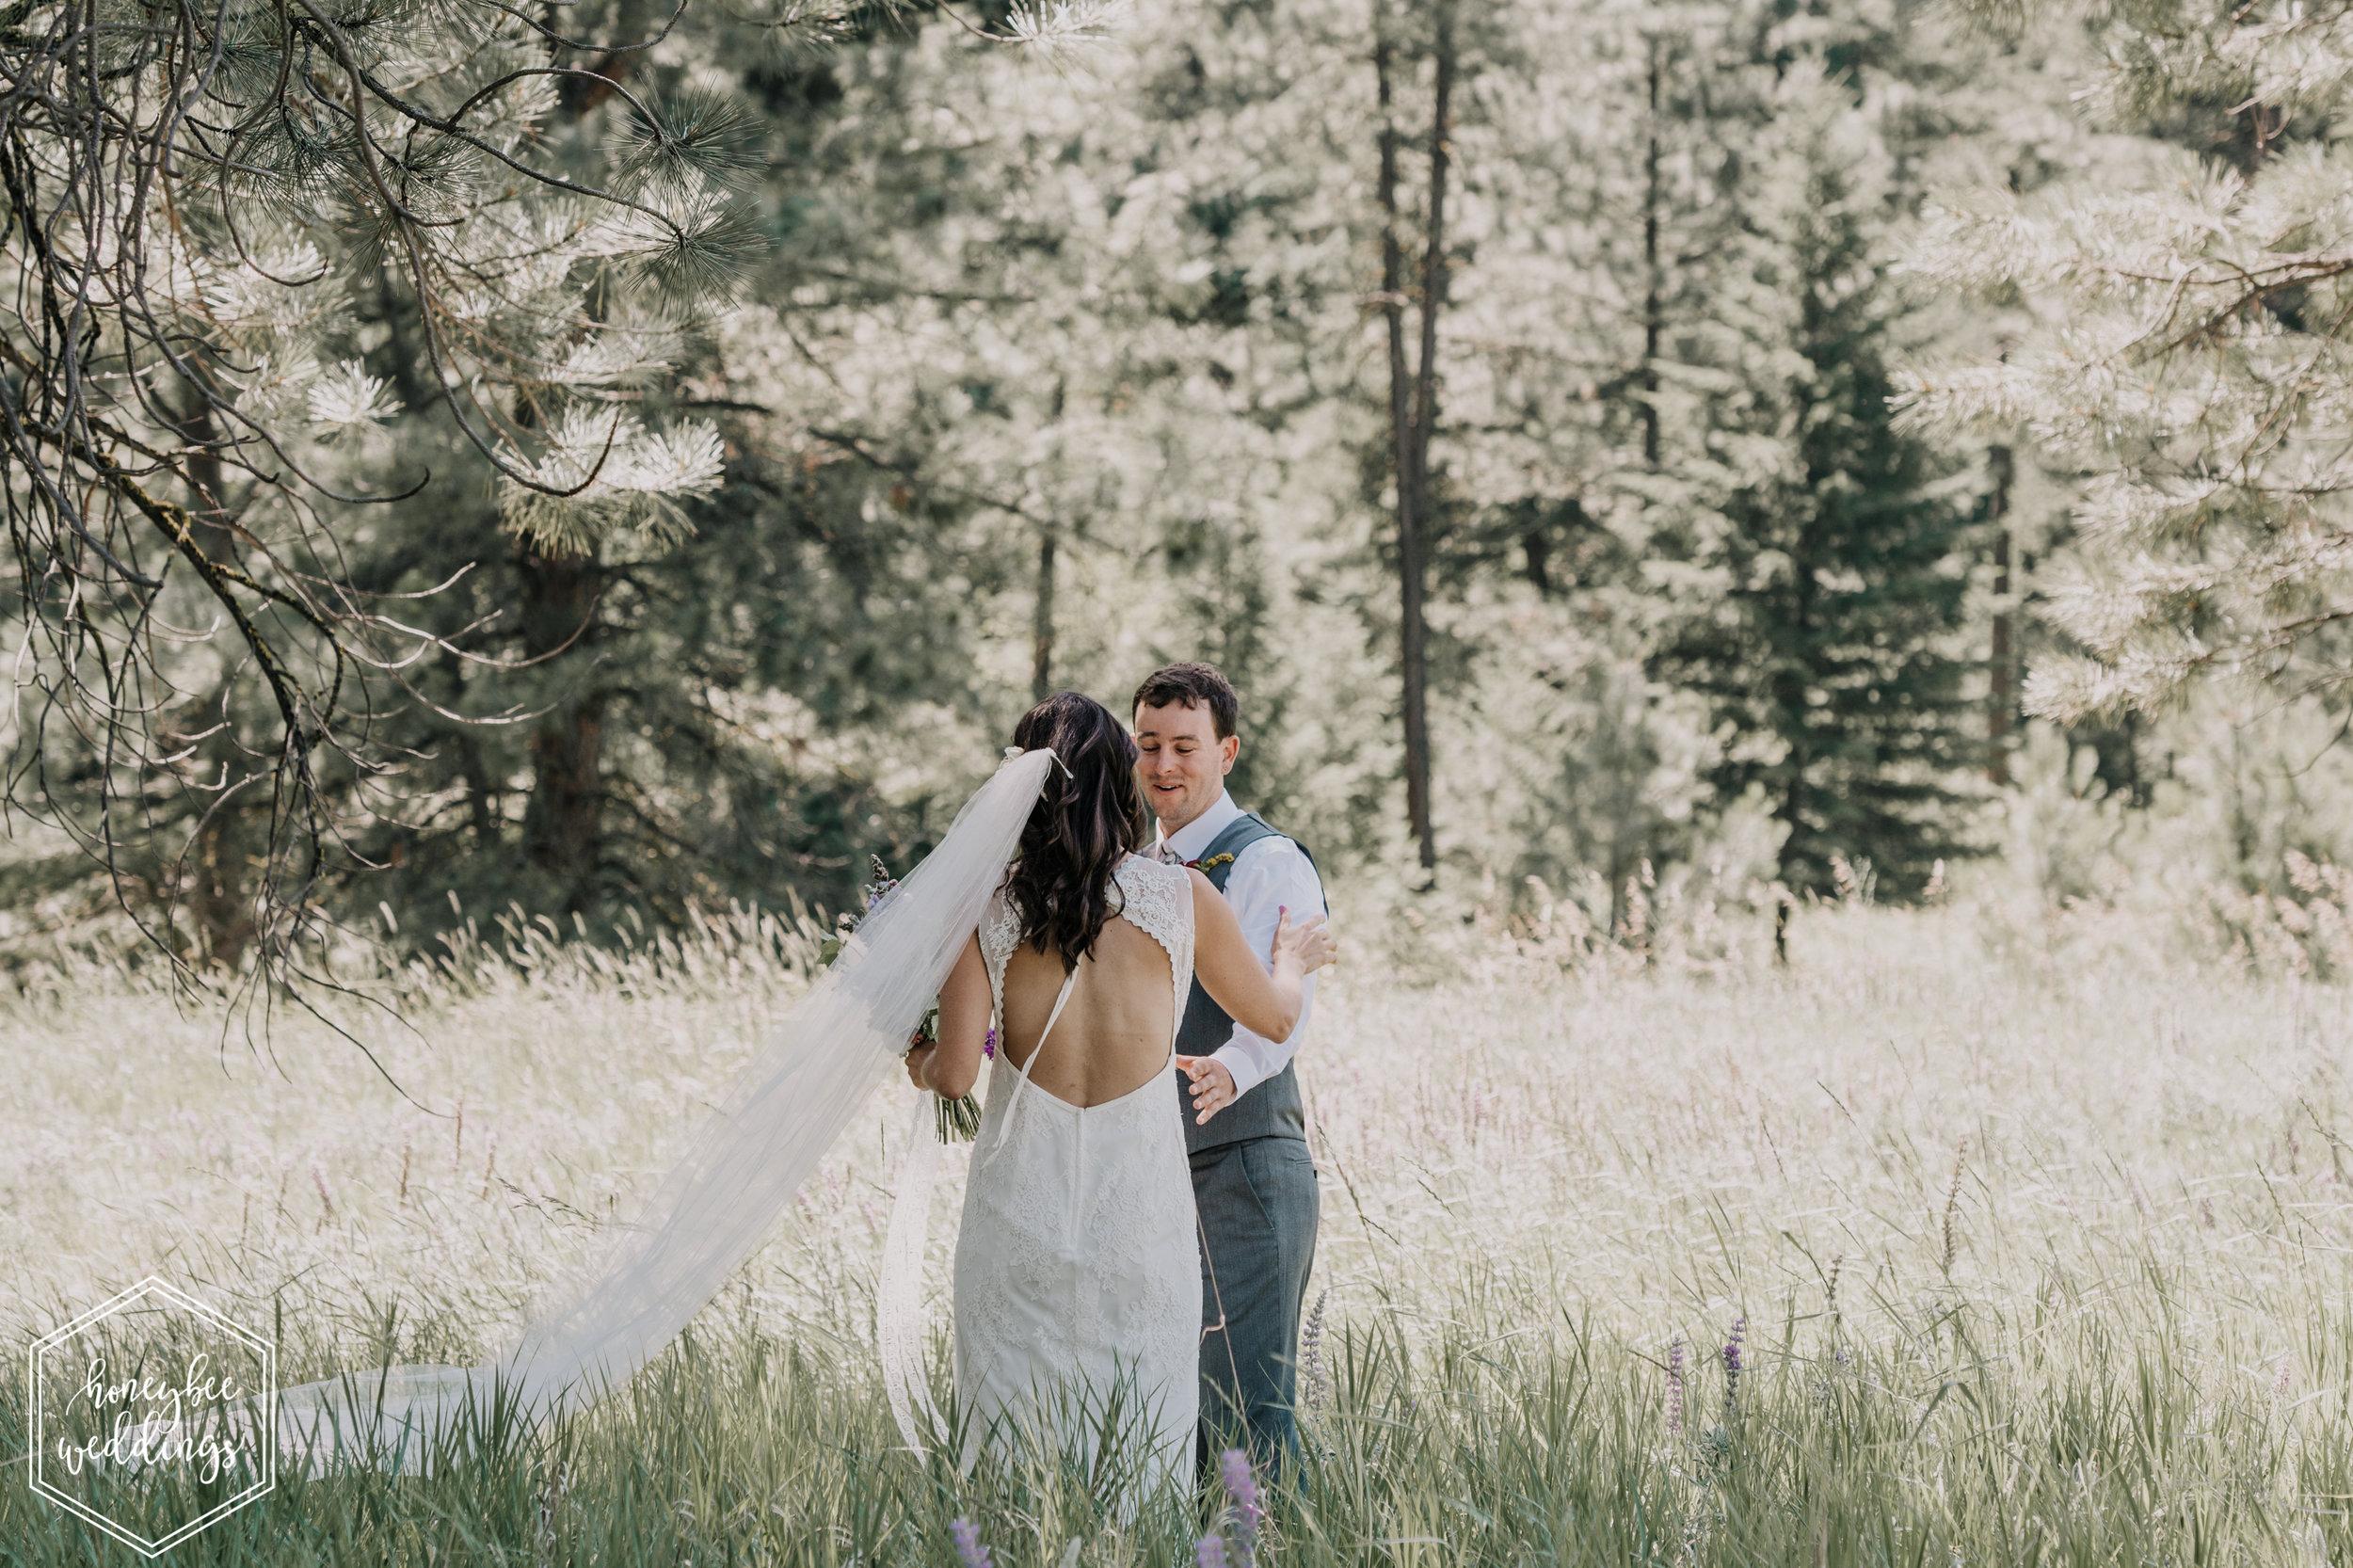 88 White Raven Wedding_Montana Wedding Photographer_Honeybee Weddings_ Meghan Maloney + Arza Hammond 2018-9212-2.jpg